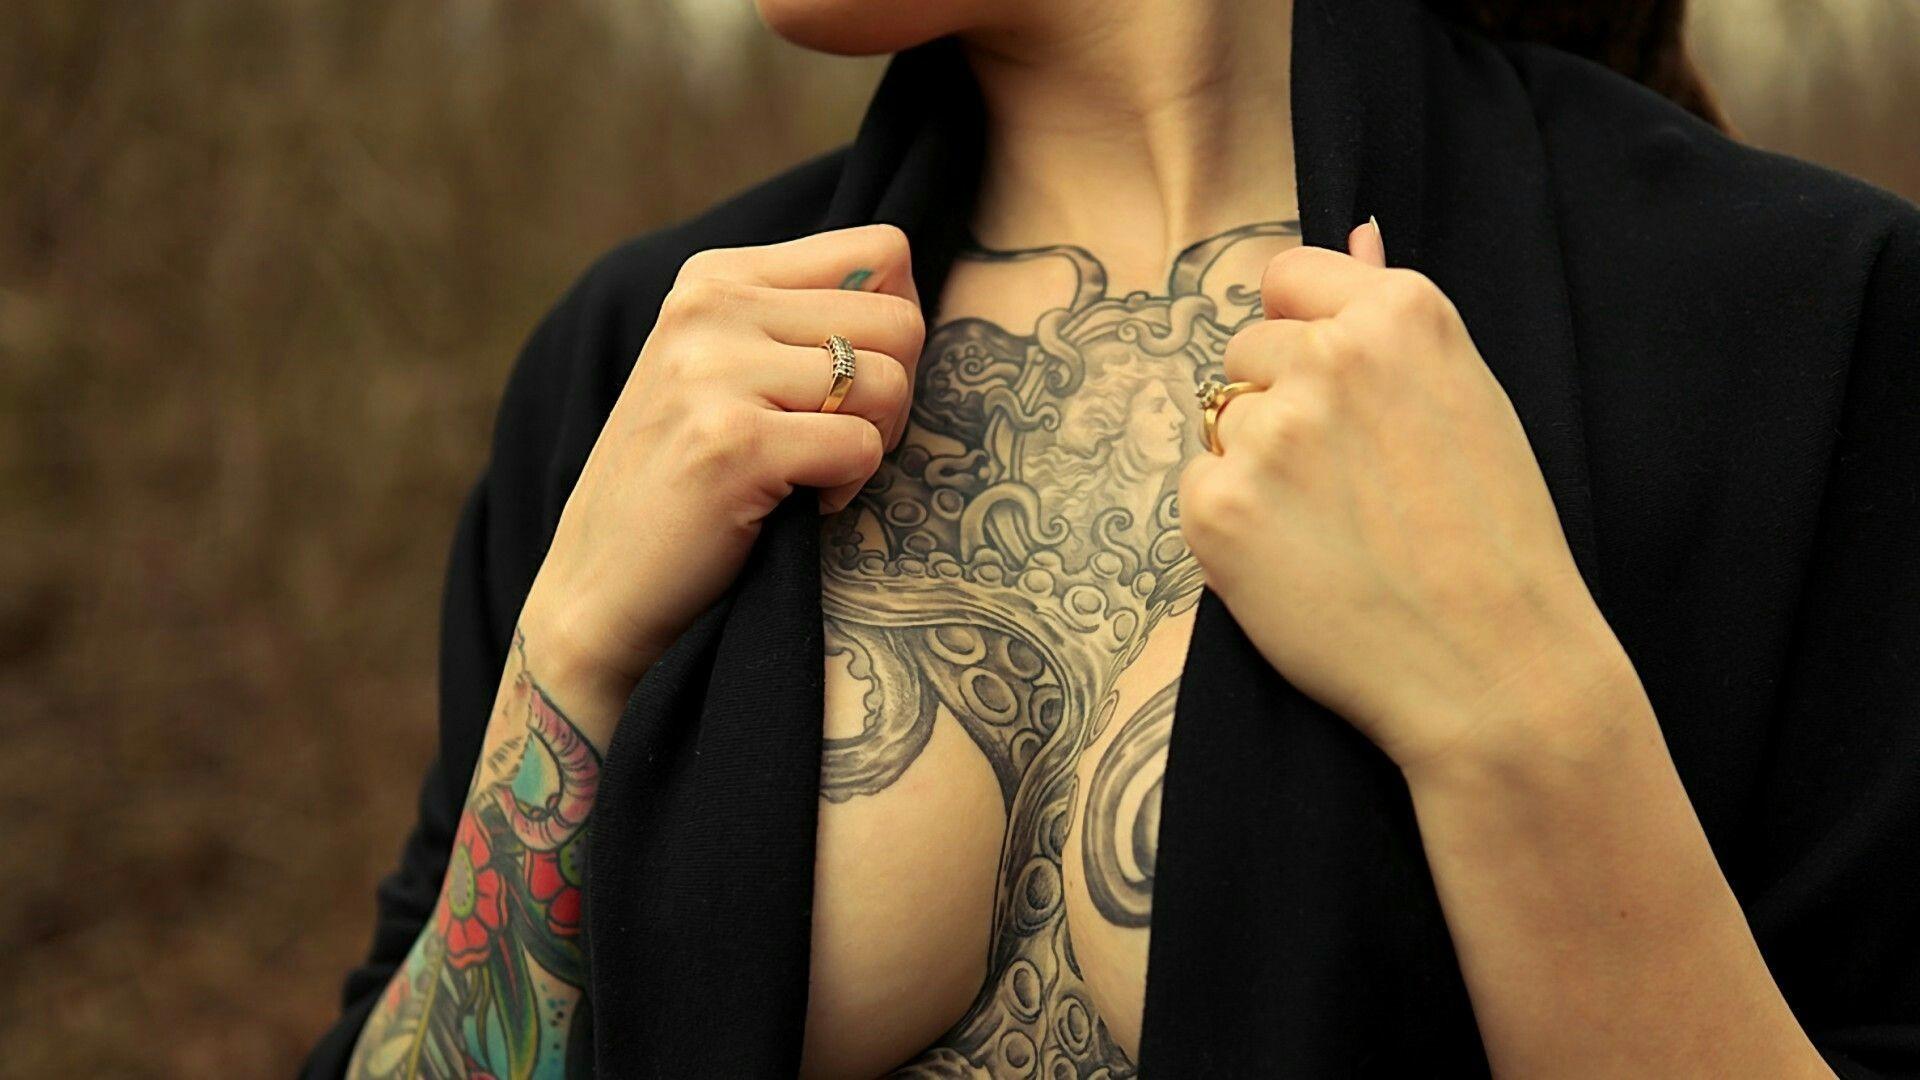 Res: 1920x1080, Best wallpaper of octopus tentacles, desktop wallpaper of tattoo on his  chest, girl